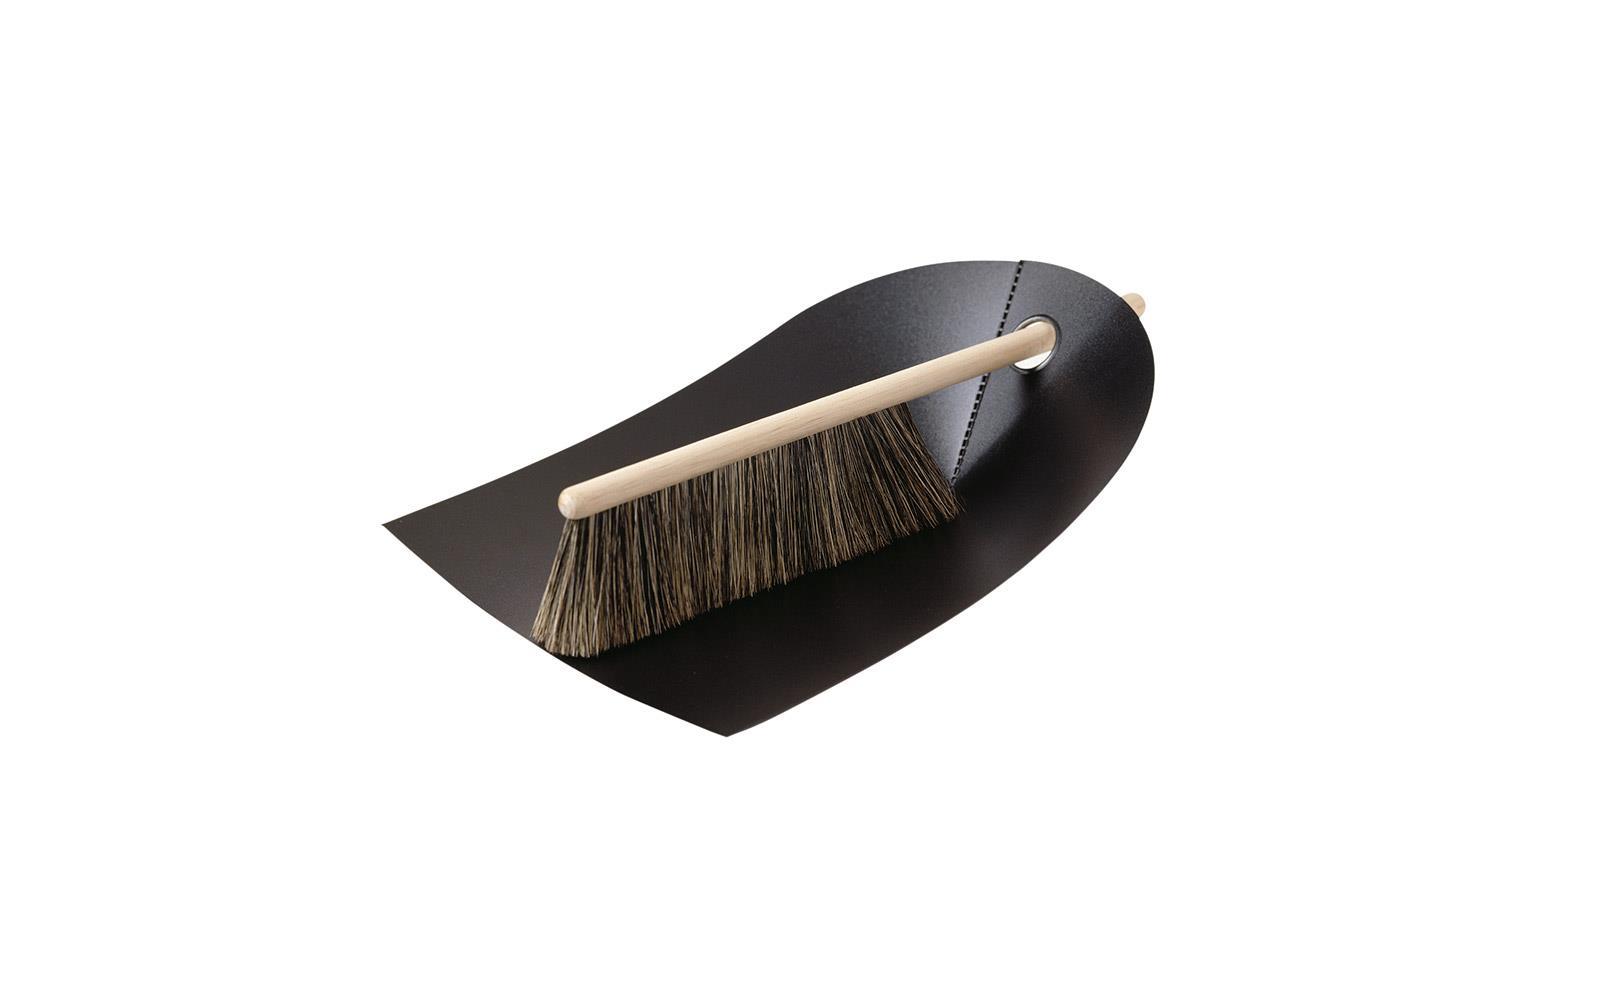 Normann Copenhagen Dustpan & Brush - £24